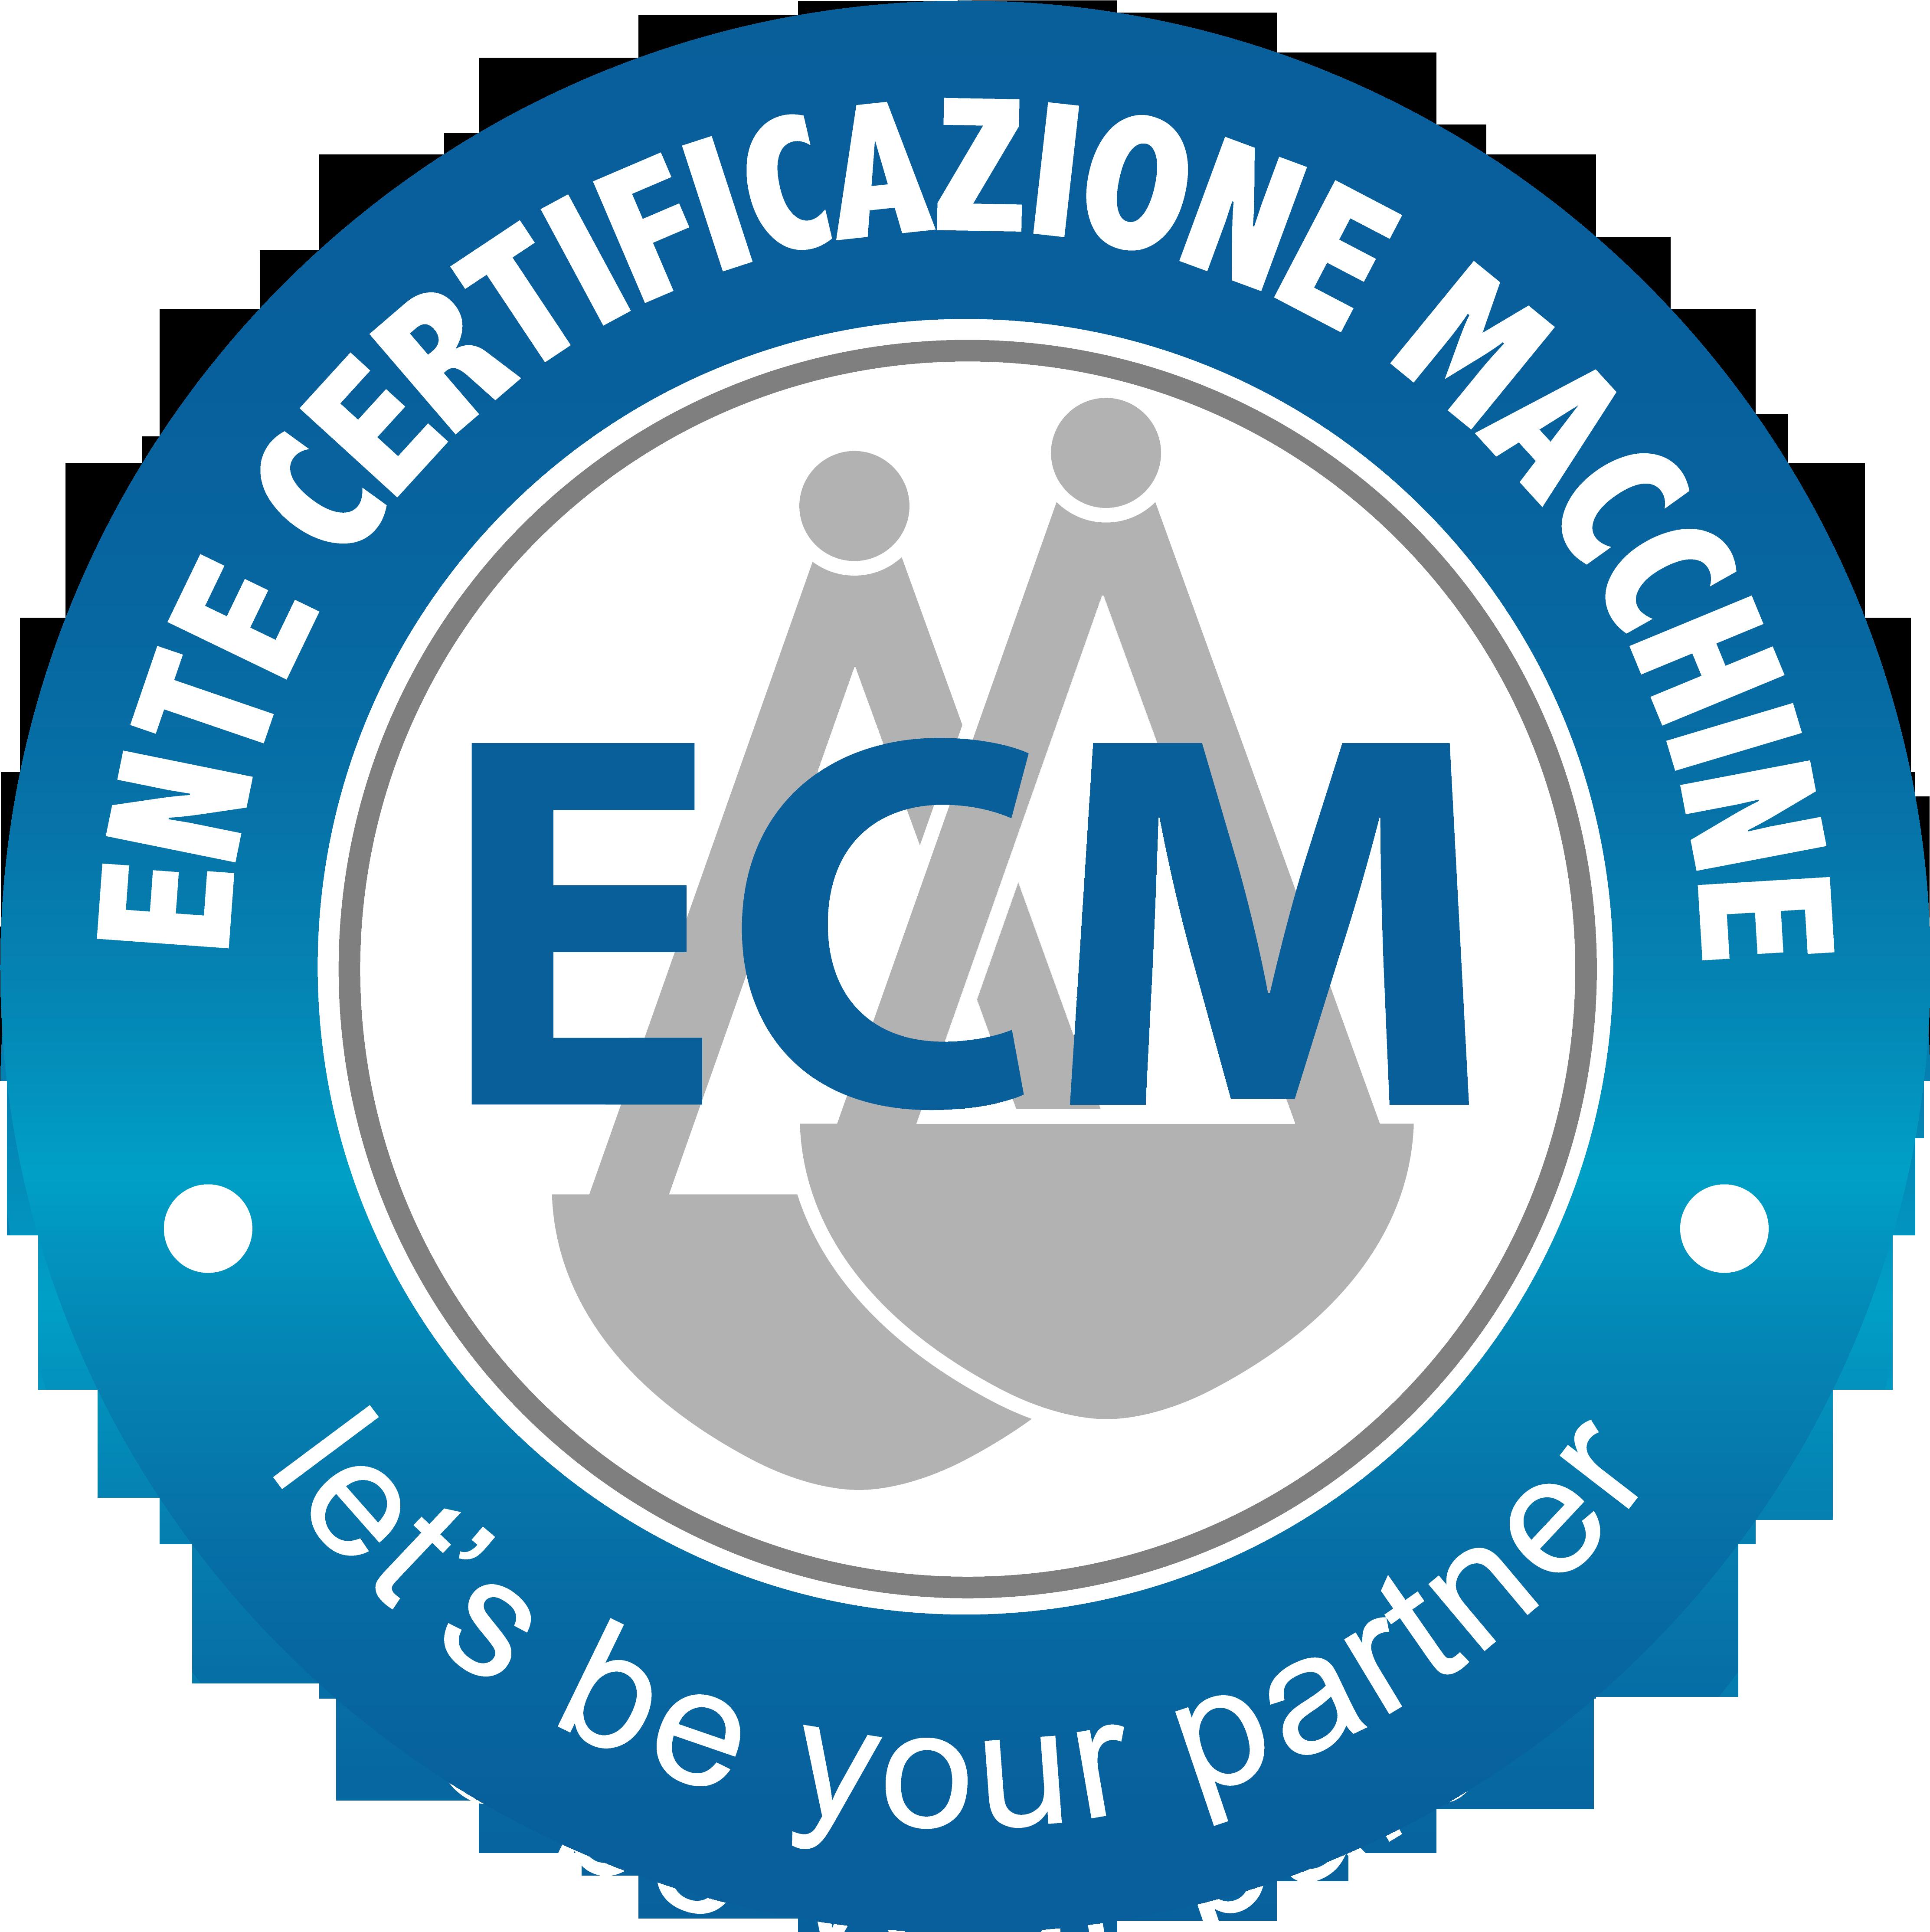 Ente Certificazione Macchine S.r.l.